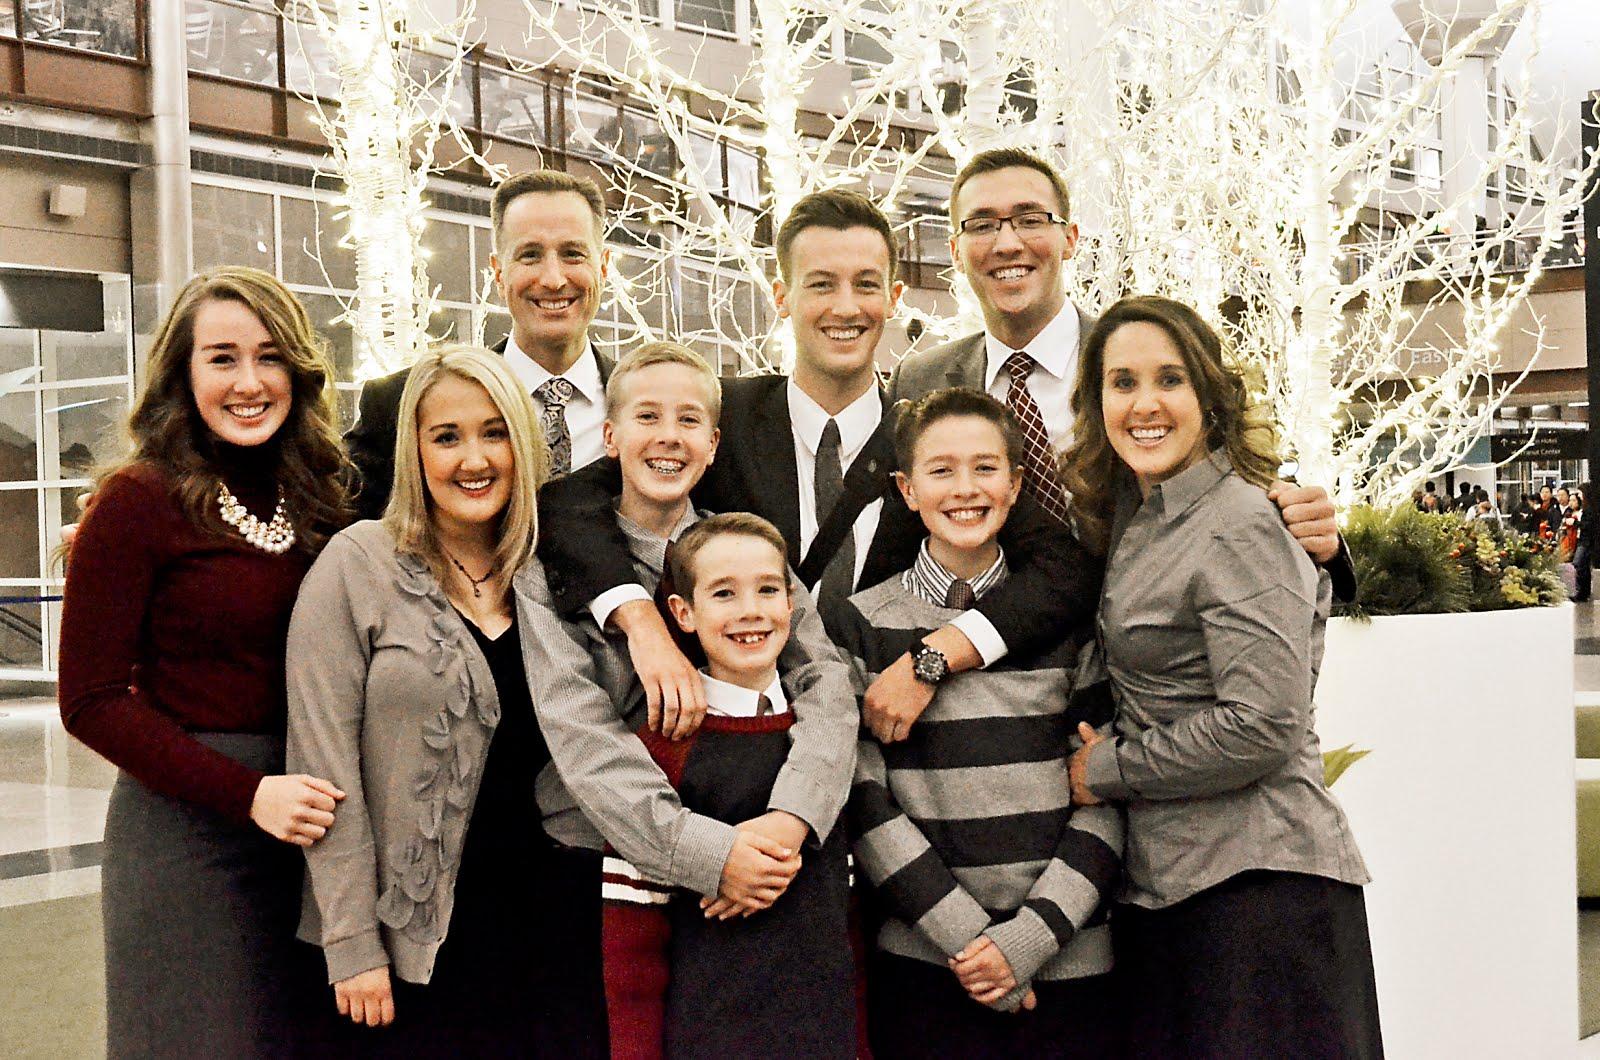 The Toronto Family